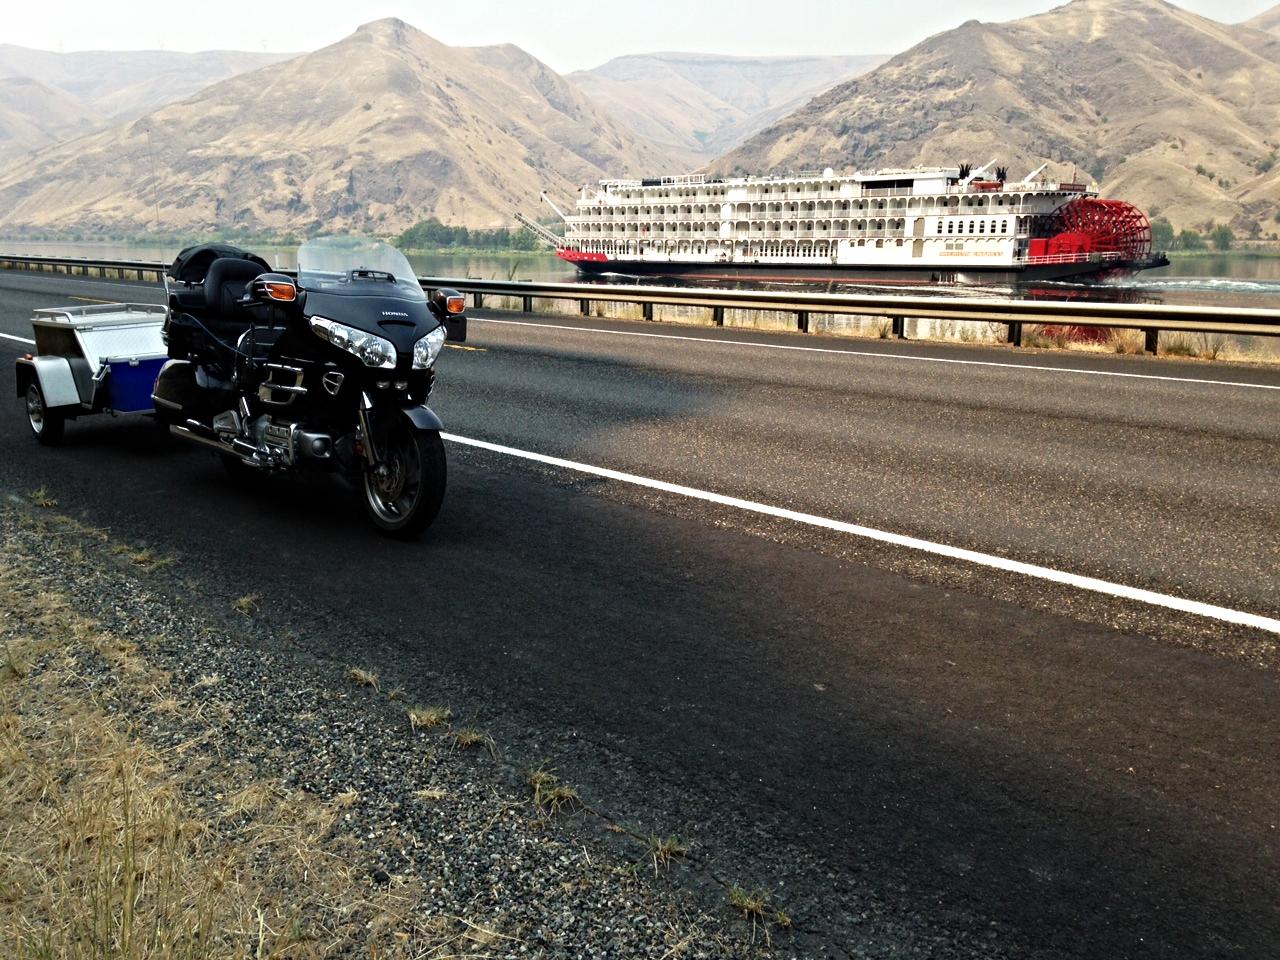 'In Idaho' Photo by Craig Bernadet